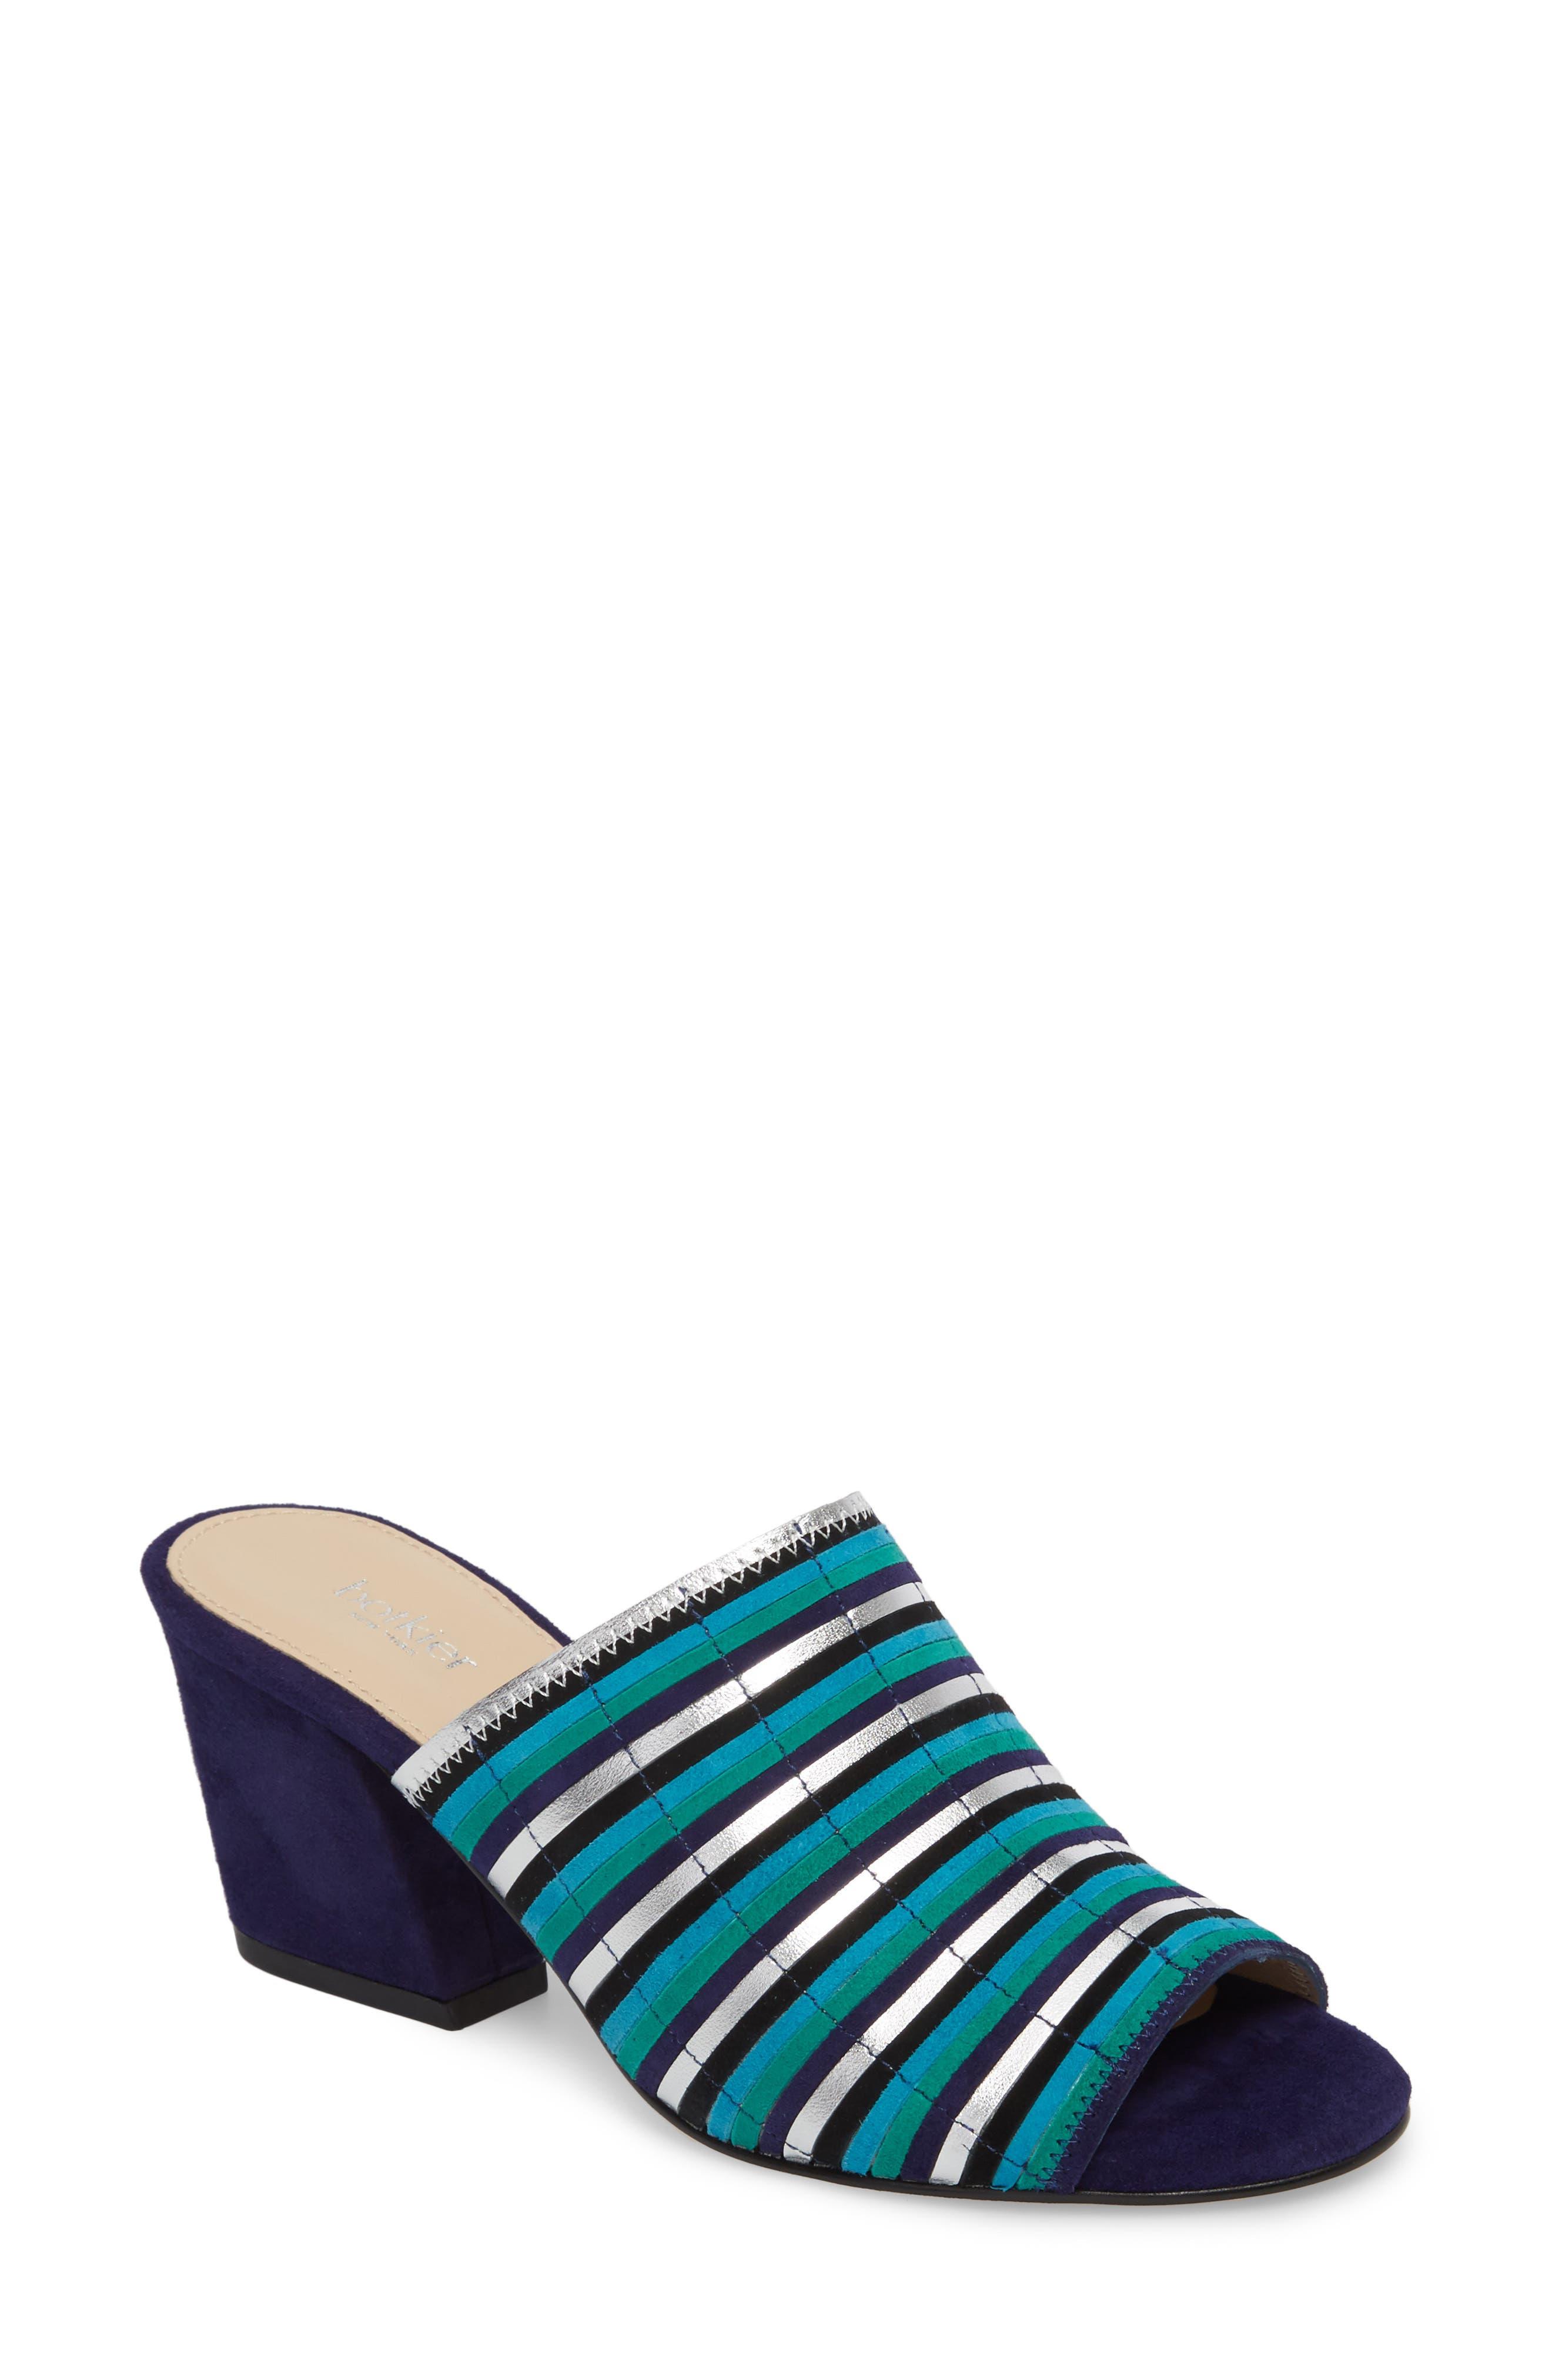 Posie Sandal,                         Main,                         color, 402